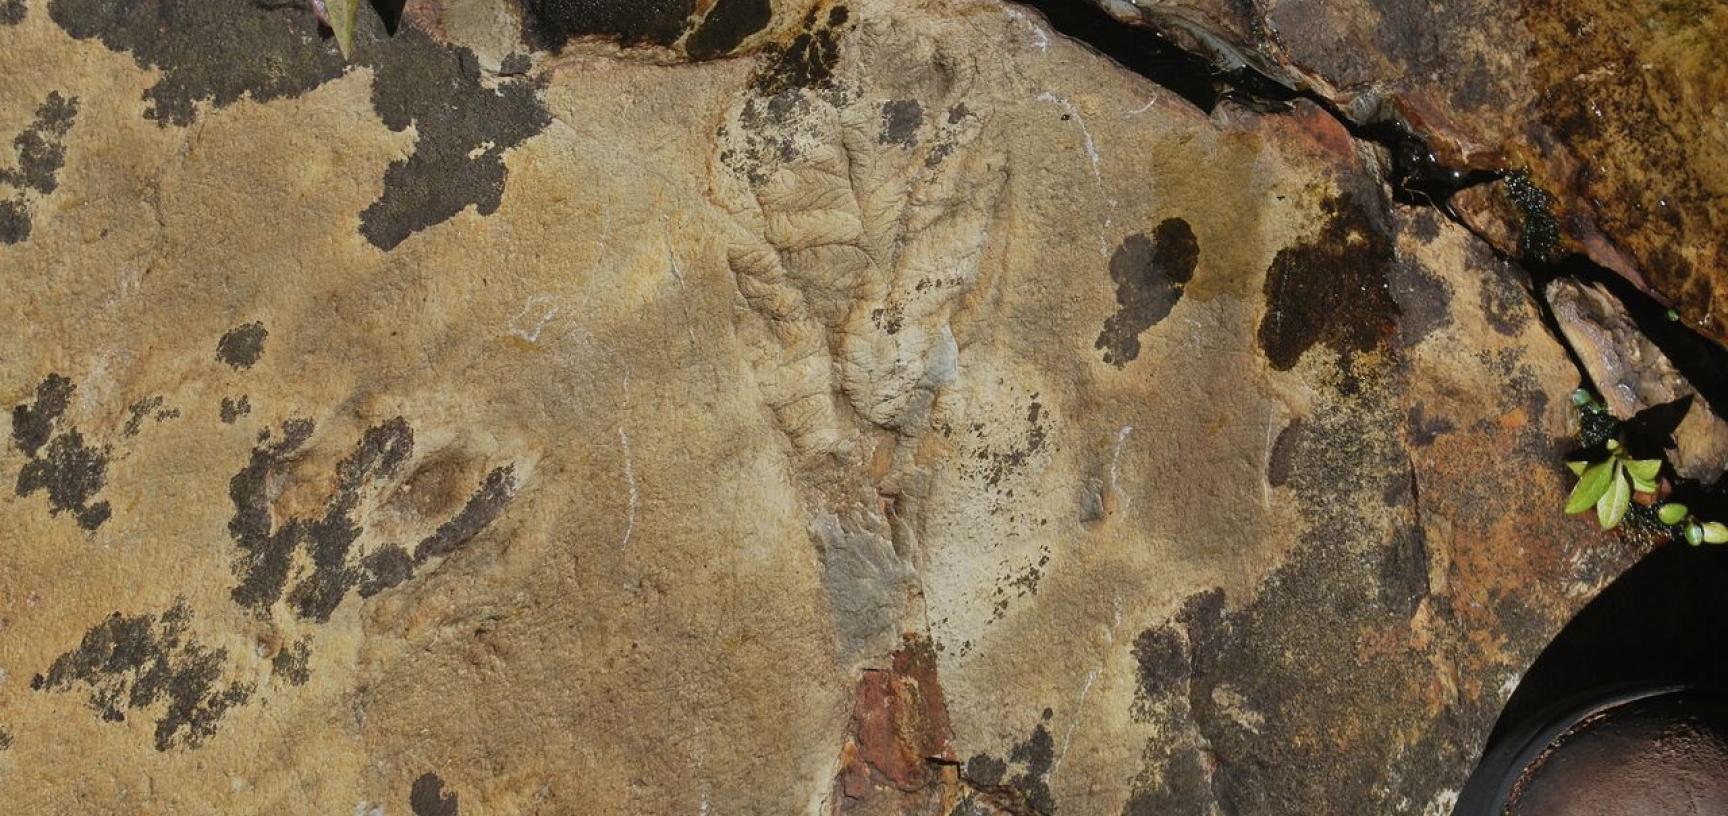 An Ediacaran frondose organism from the Discovery Aspiring UNESCO Geopark, Newfoundland